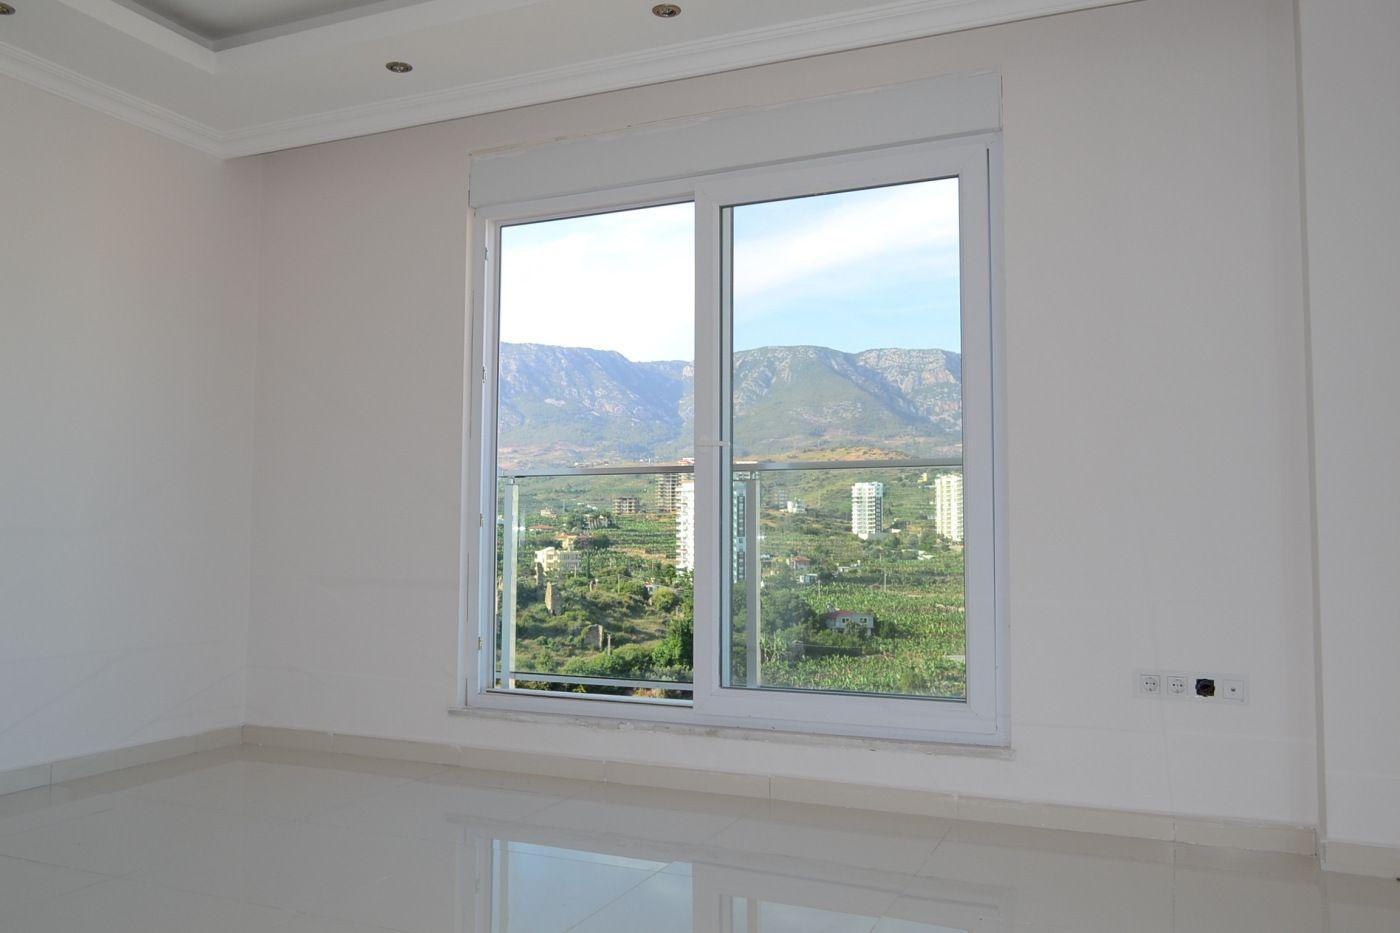 Ma b mini penthouse for sale on th floor of bay mahmutlar